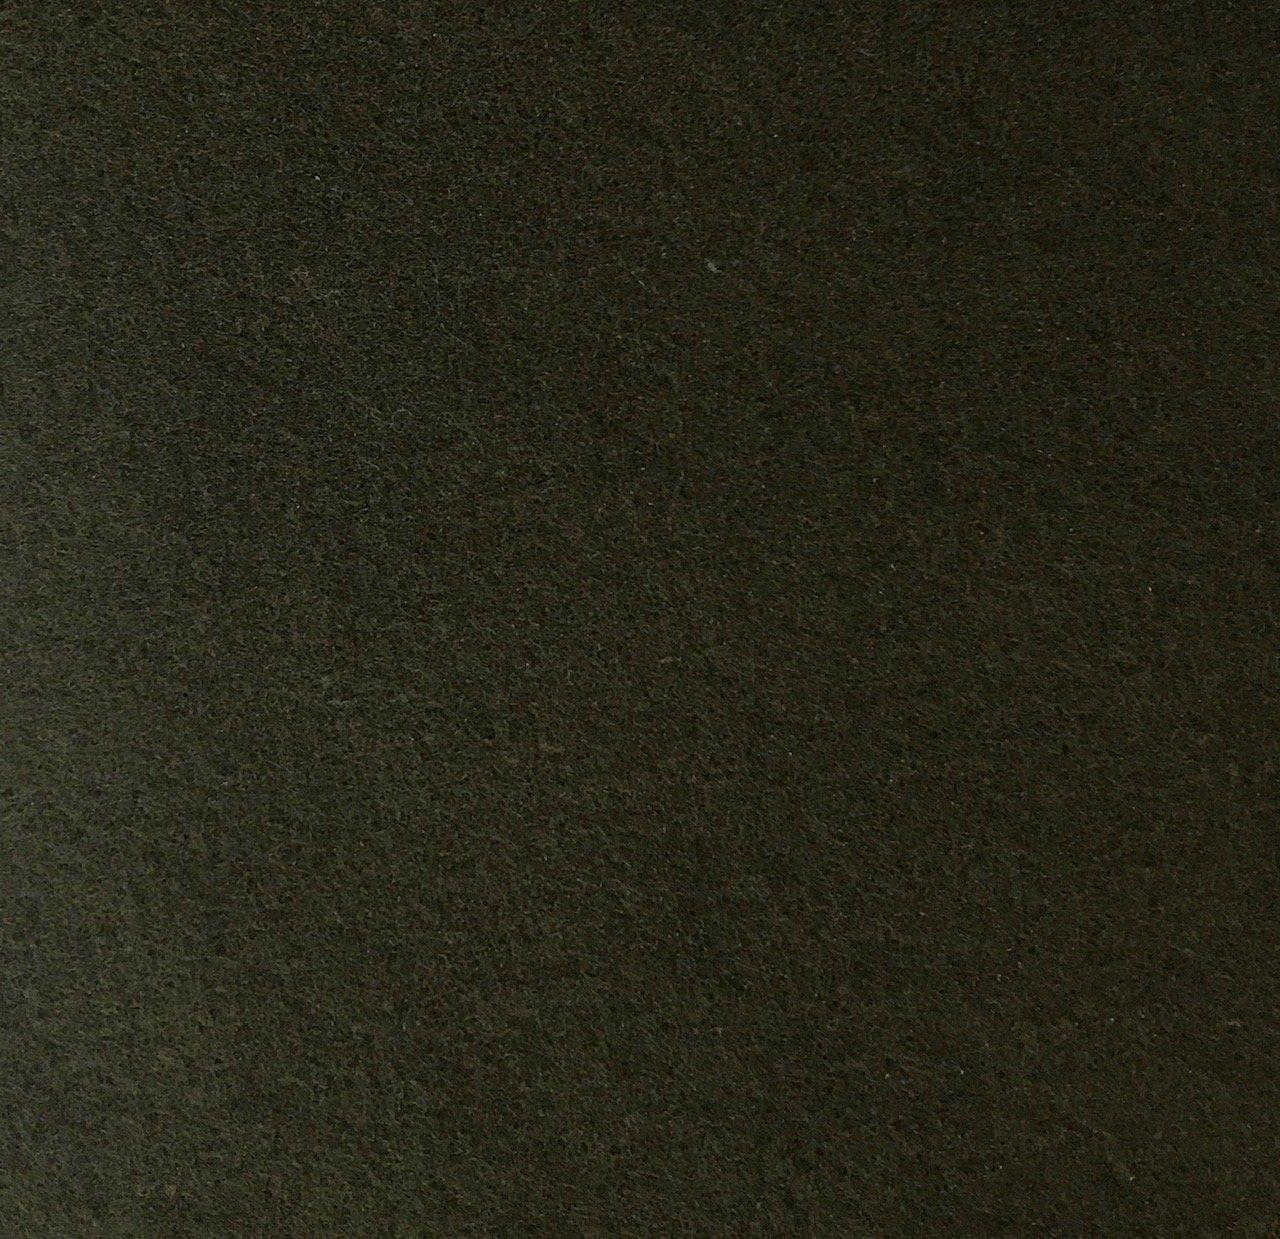 PowerStretch - Dark Olive Green